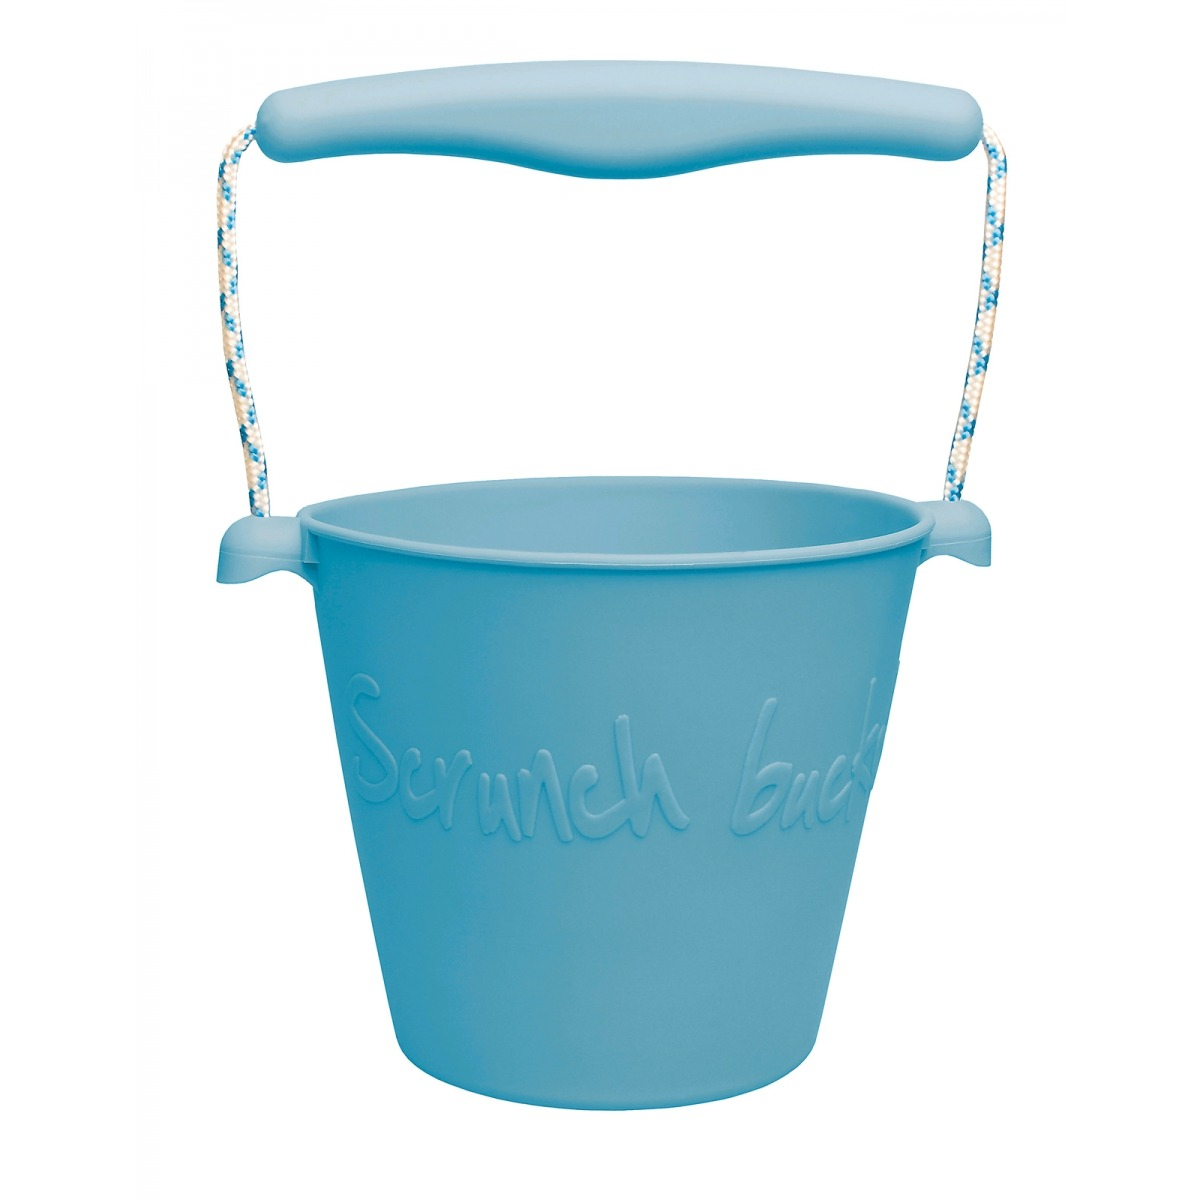 skladane-wiaderko-do-wody-i-piasku-scrunch-bucket-petrol